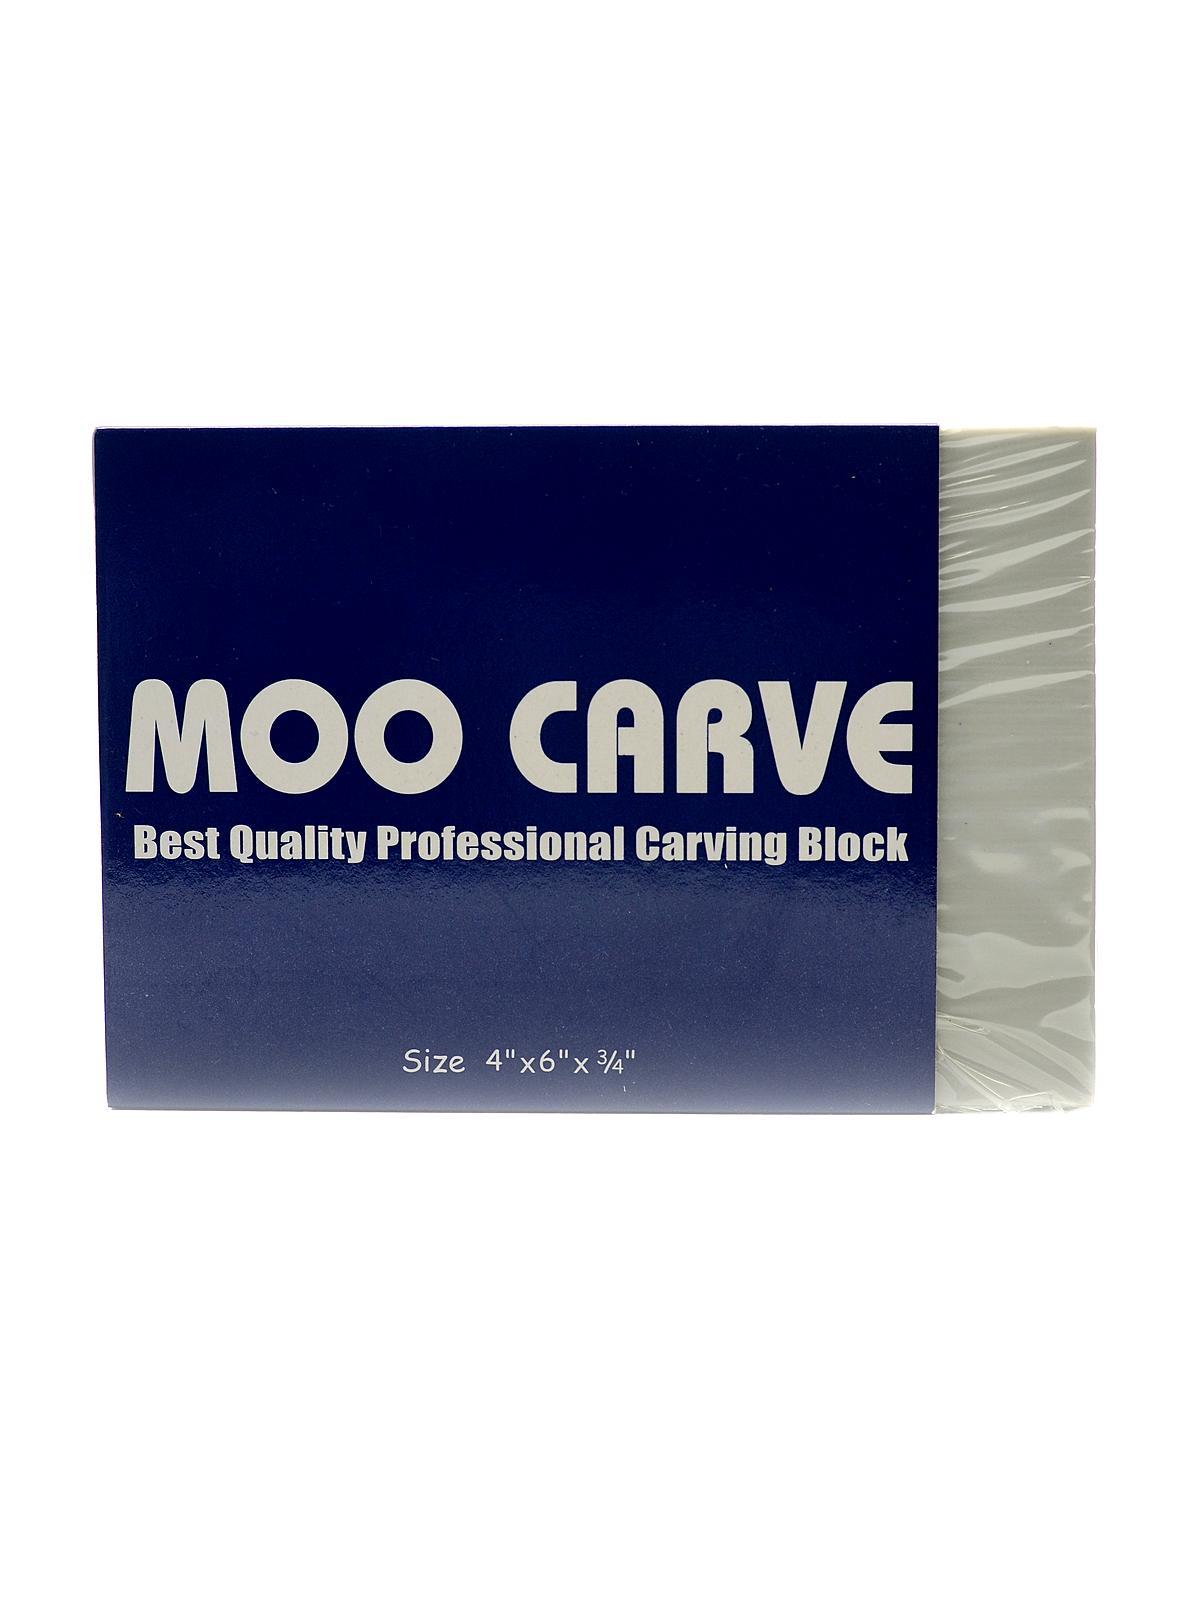 Martin/Universal Moo Carve Artist Carving Block MisterArt.com